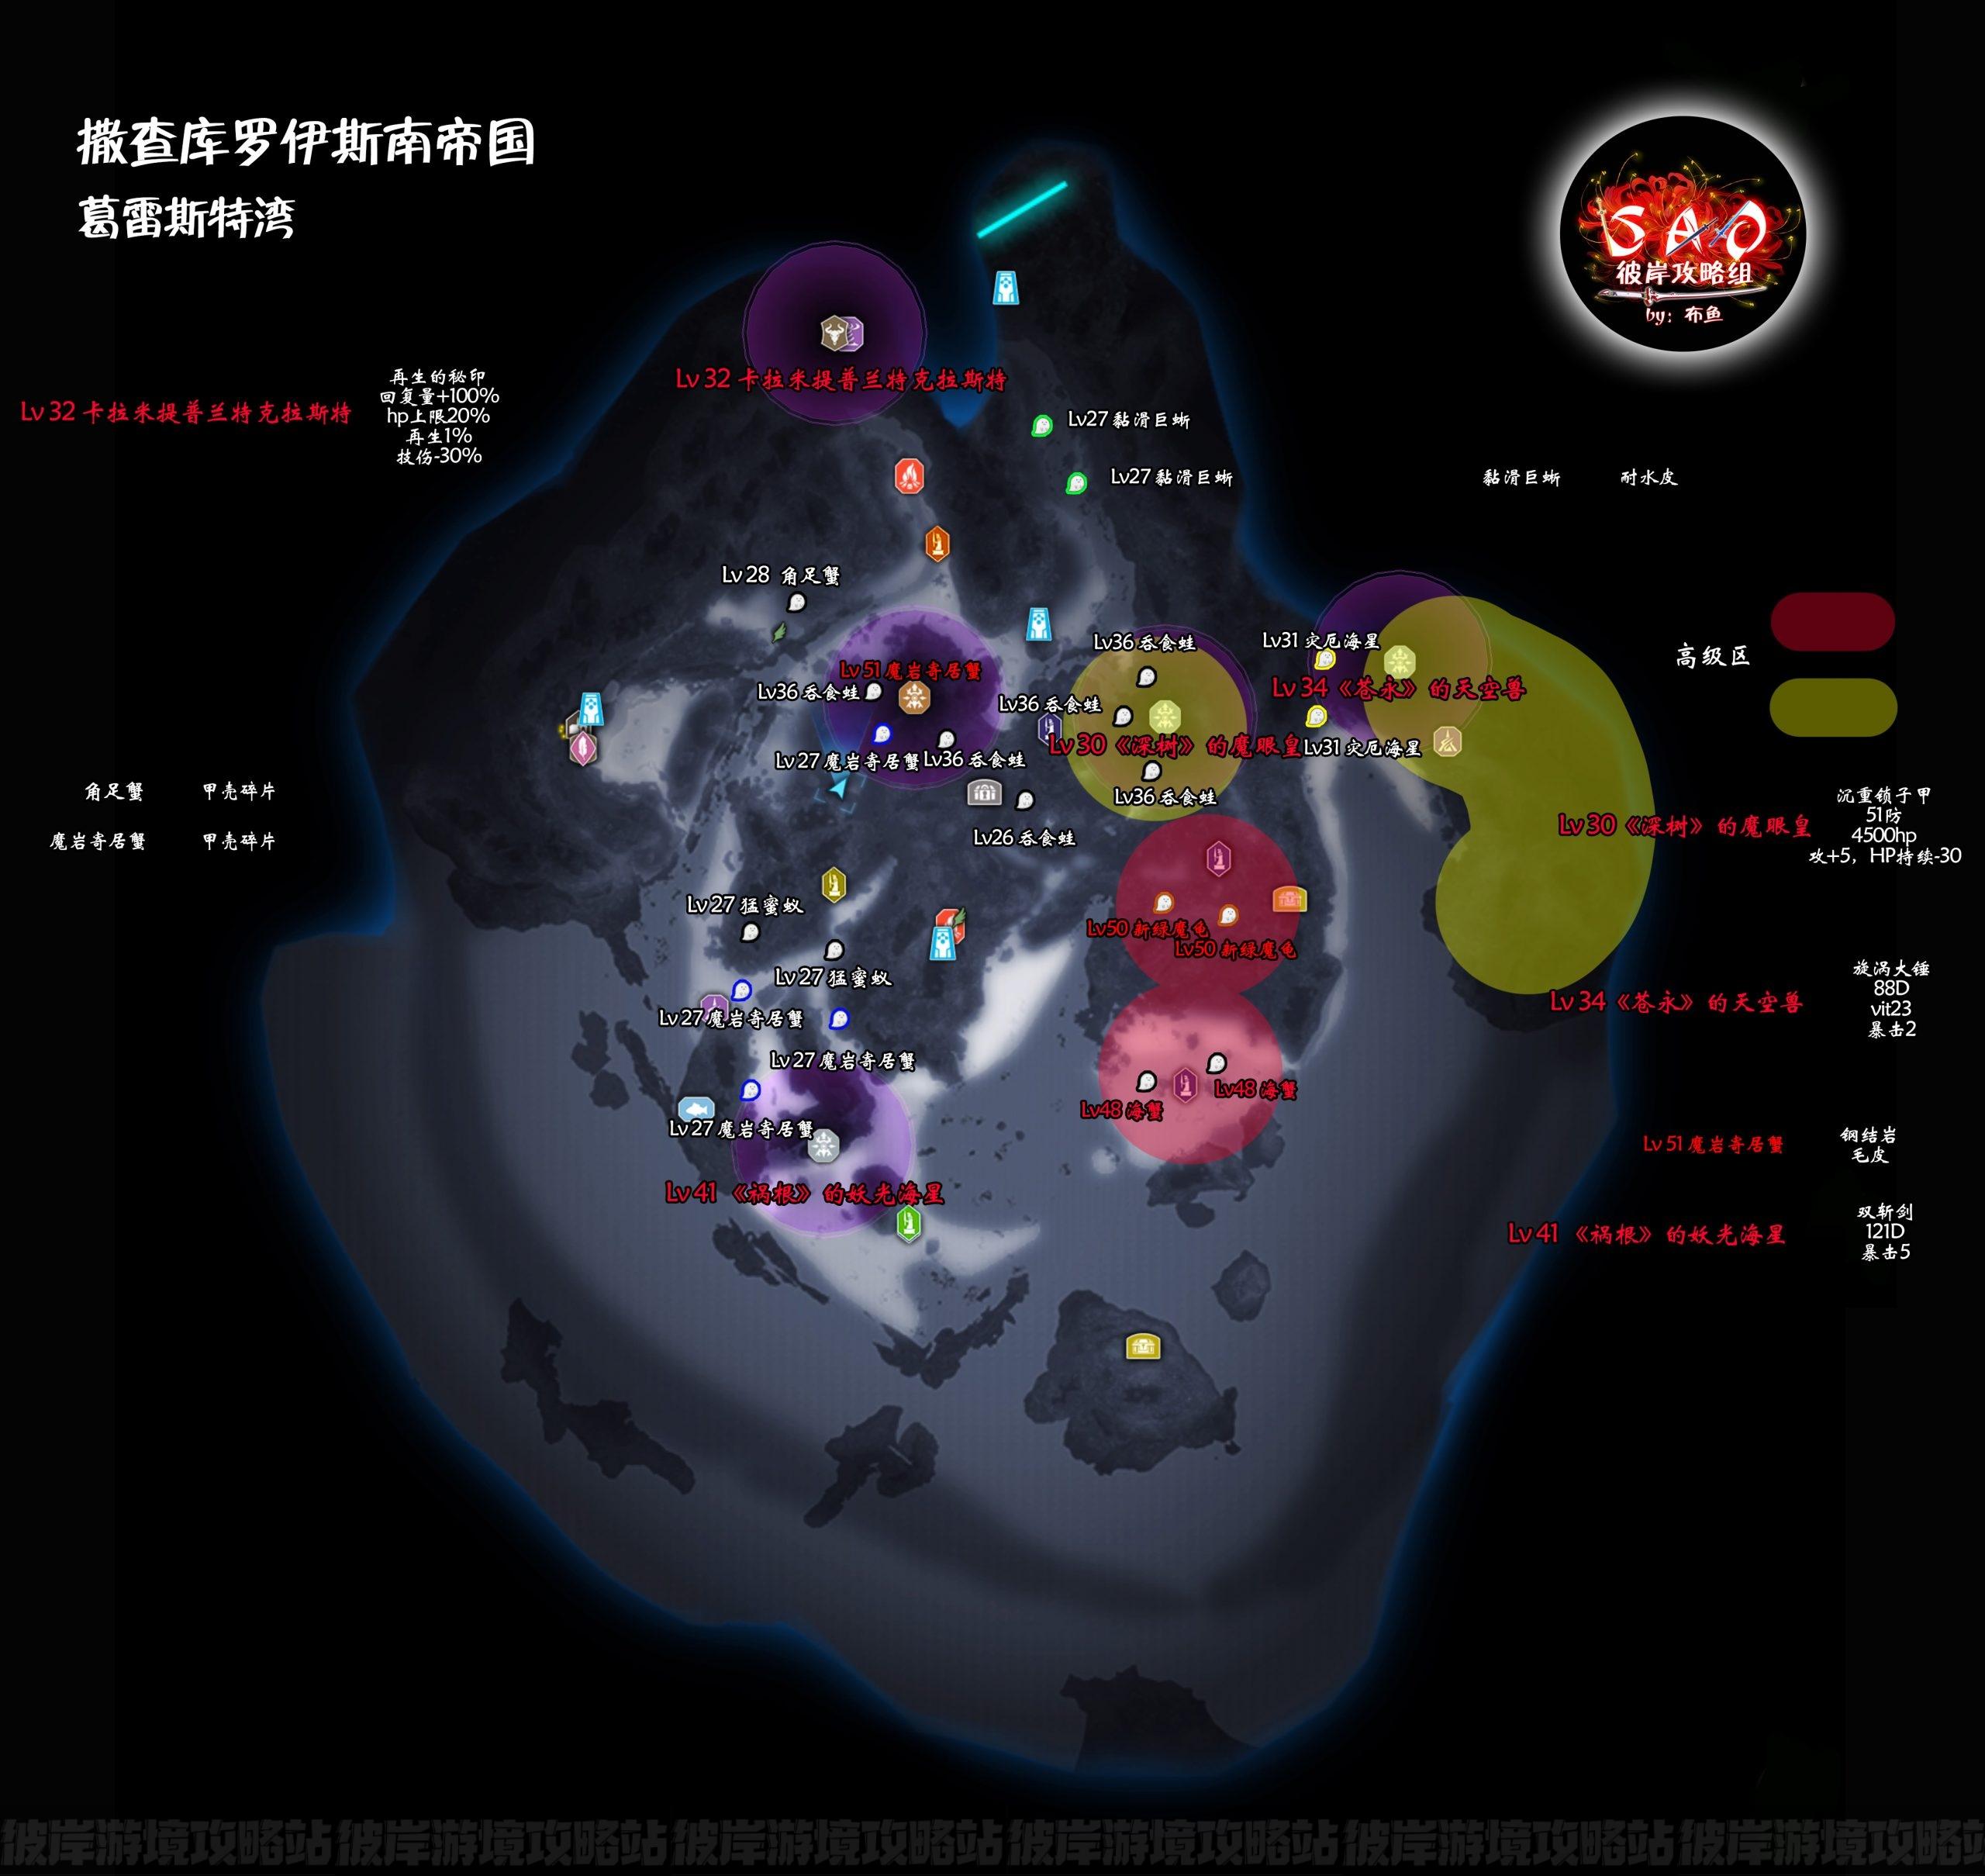 【SAOAL攻略组】超完全流程地图攻略及新手指引-葛雷斯特湾篇-刀剑神域彼岸游境攻略站